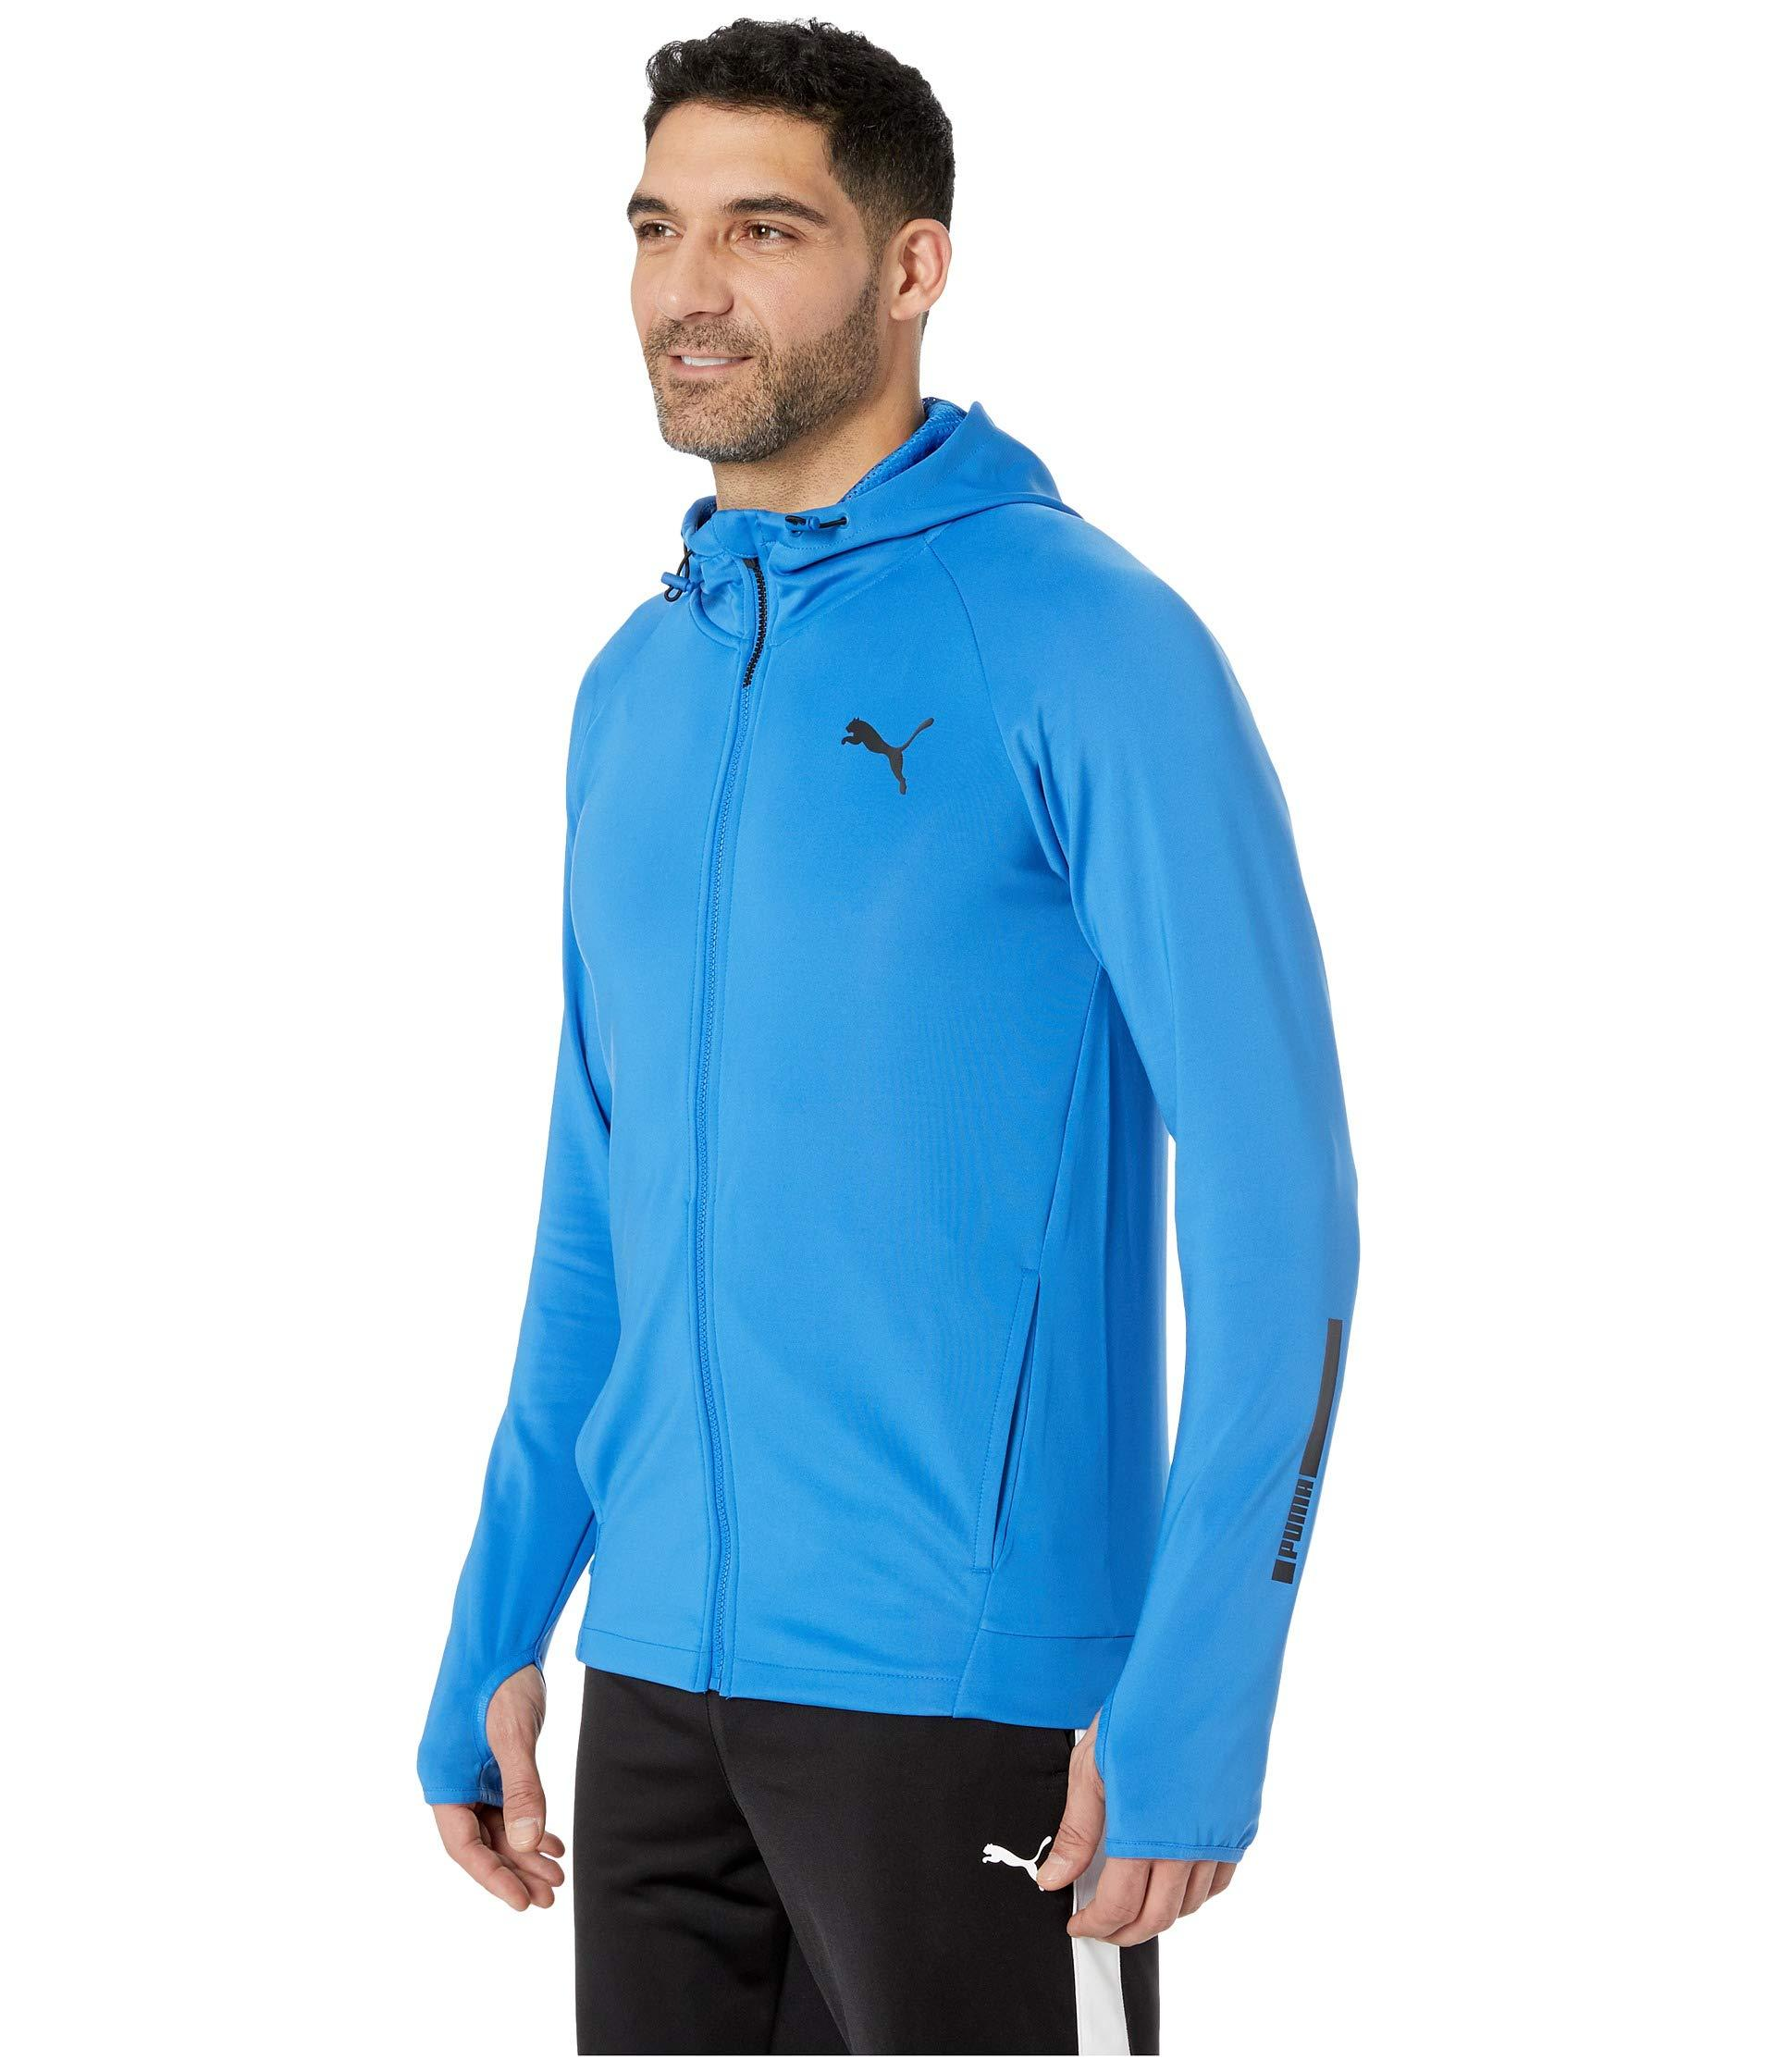 53617f60abca Lyst - PUMA Tec Sports Full Zip Hoody in Blue for Men - Save 38%